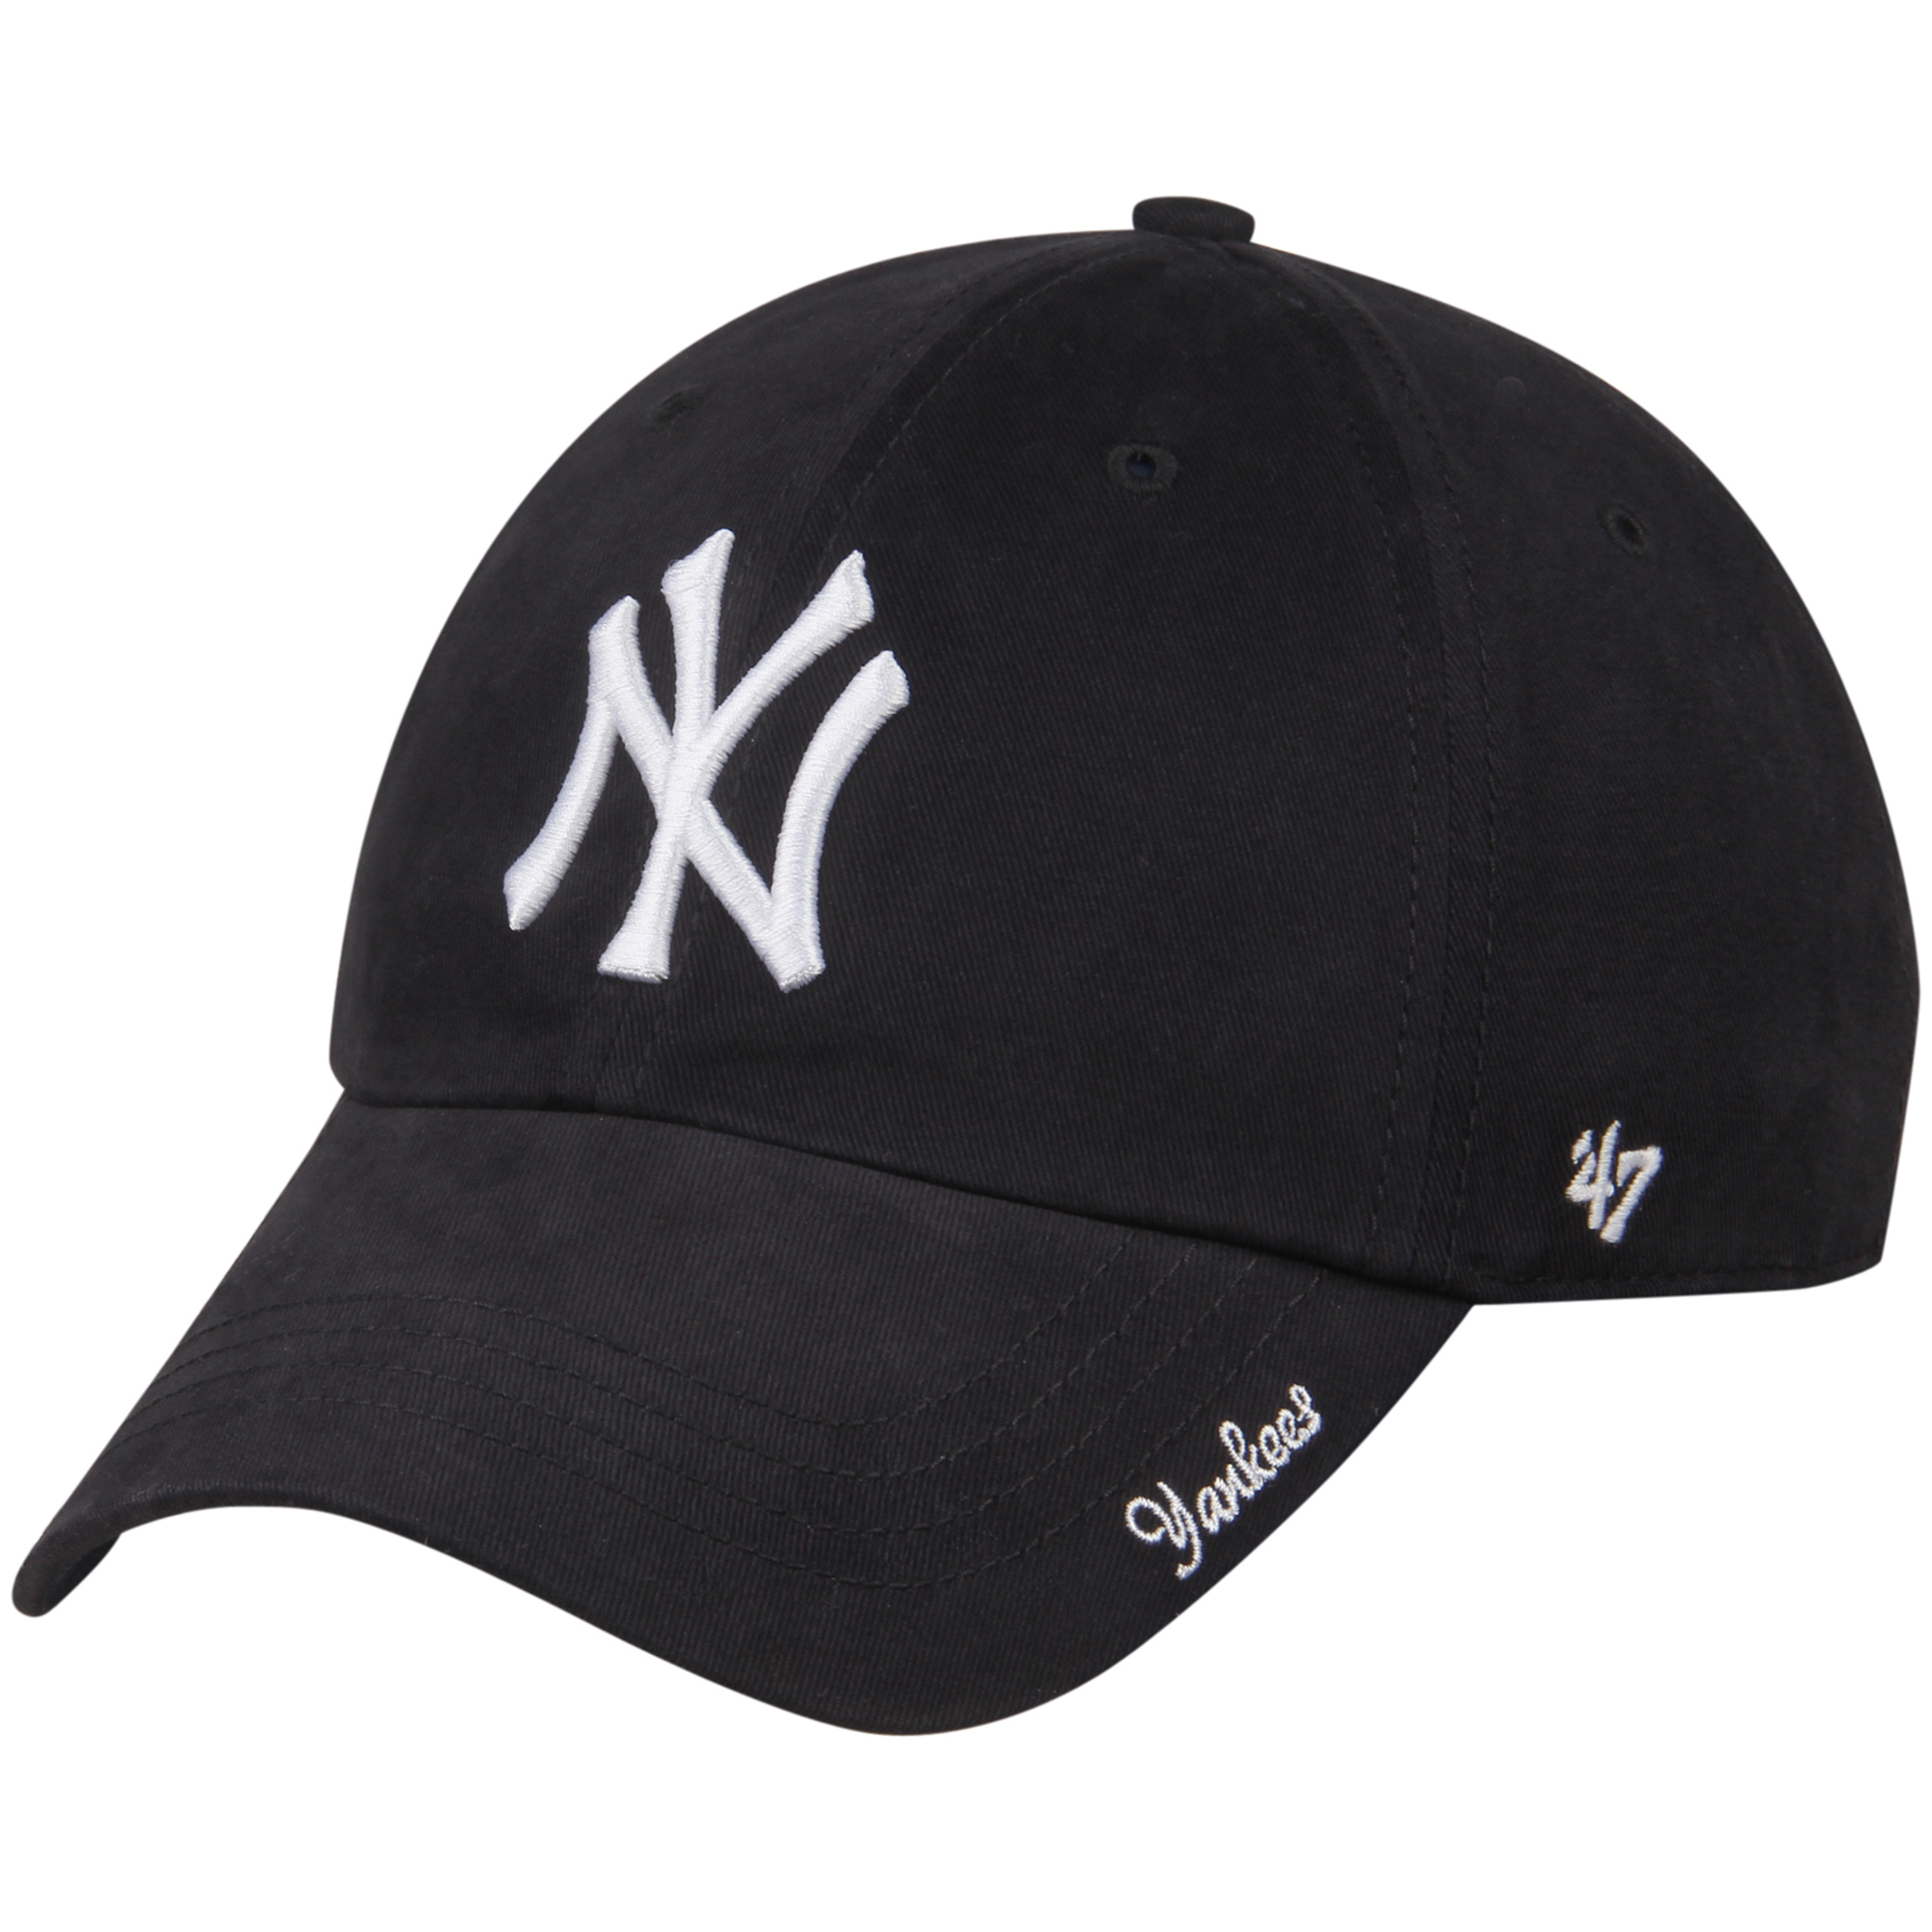 New York Yankees '47 Women's Miata Clean Up Adjustable Hat - Navy - OSFA